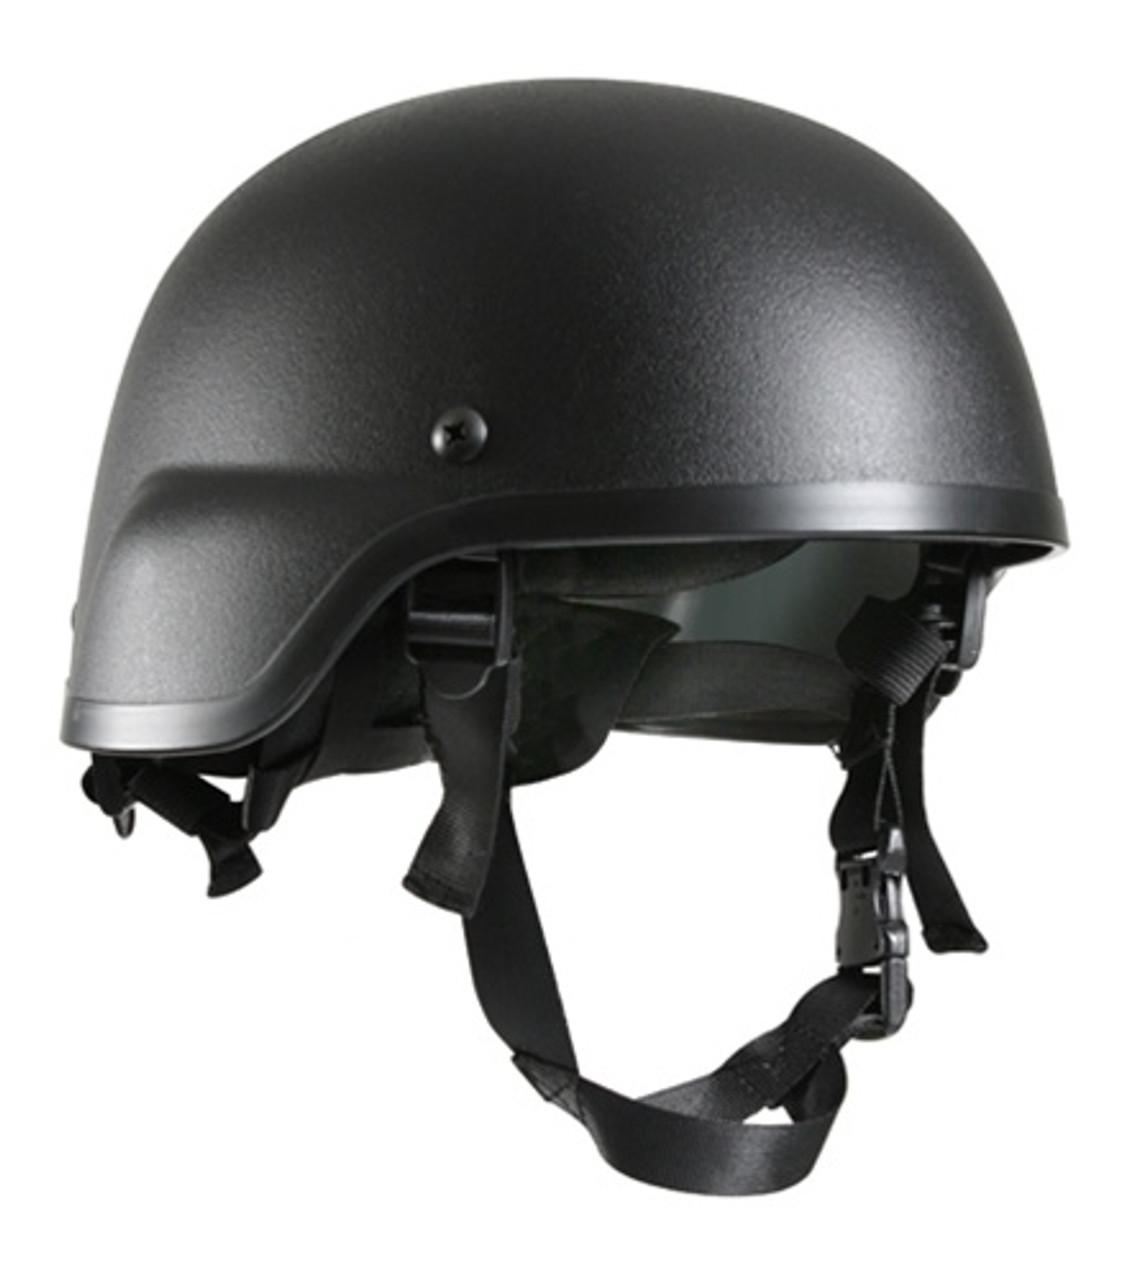 G.I. Type OD MICH-2000 Helmet from Hessen Antique